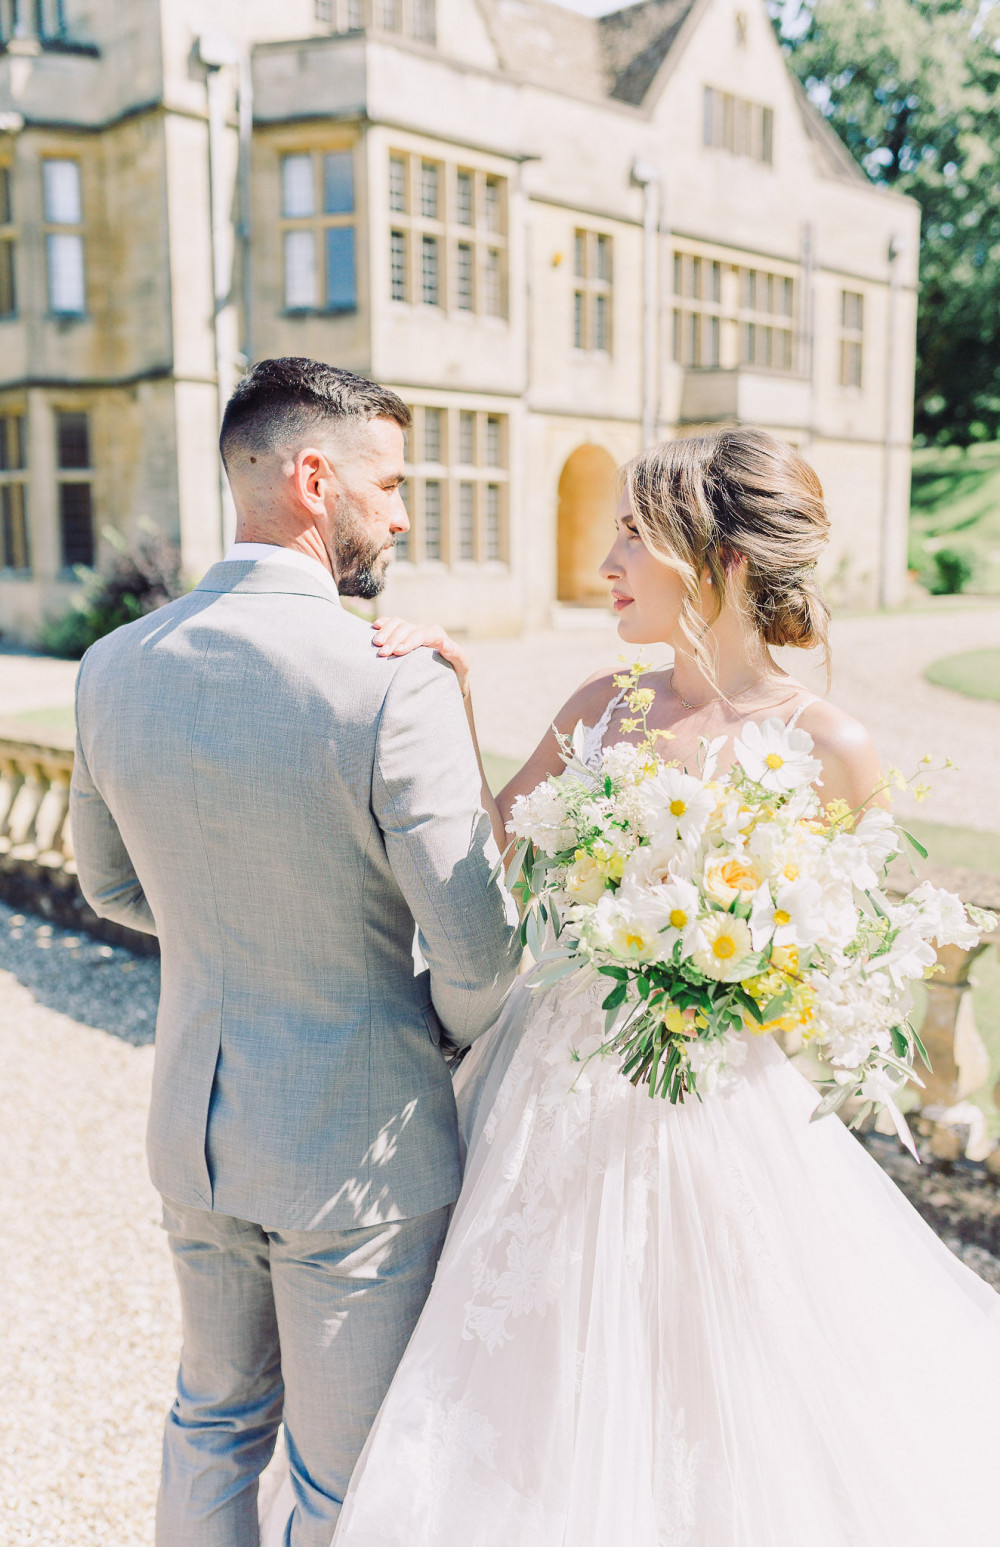 Beautiful bridal shoot at Coombe Lodge. - Make Me Bridal Artist: Loxus Hair and Make-up by Maya Jasinska HMUA. Photography by: Dominica ler. #classic #glamorous